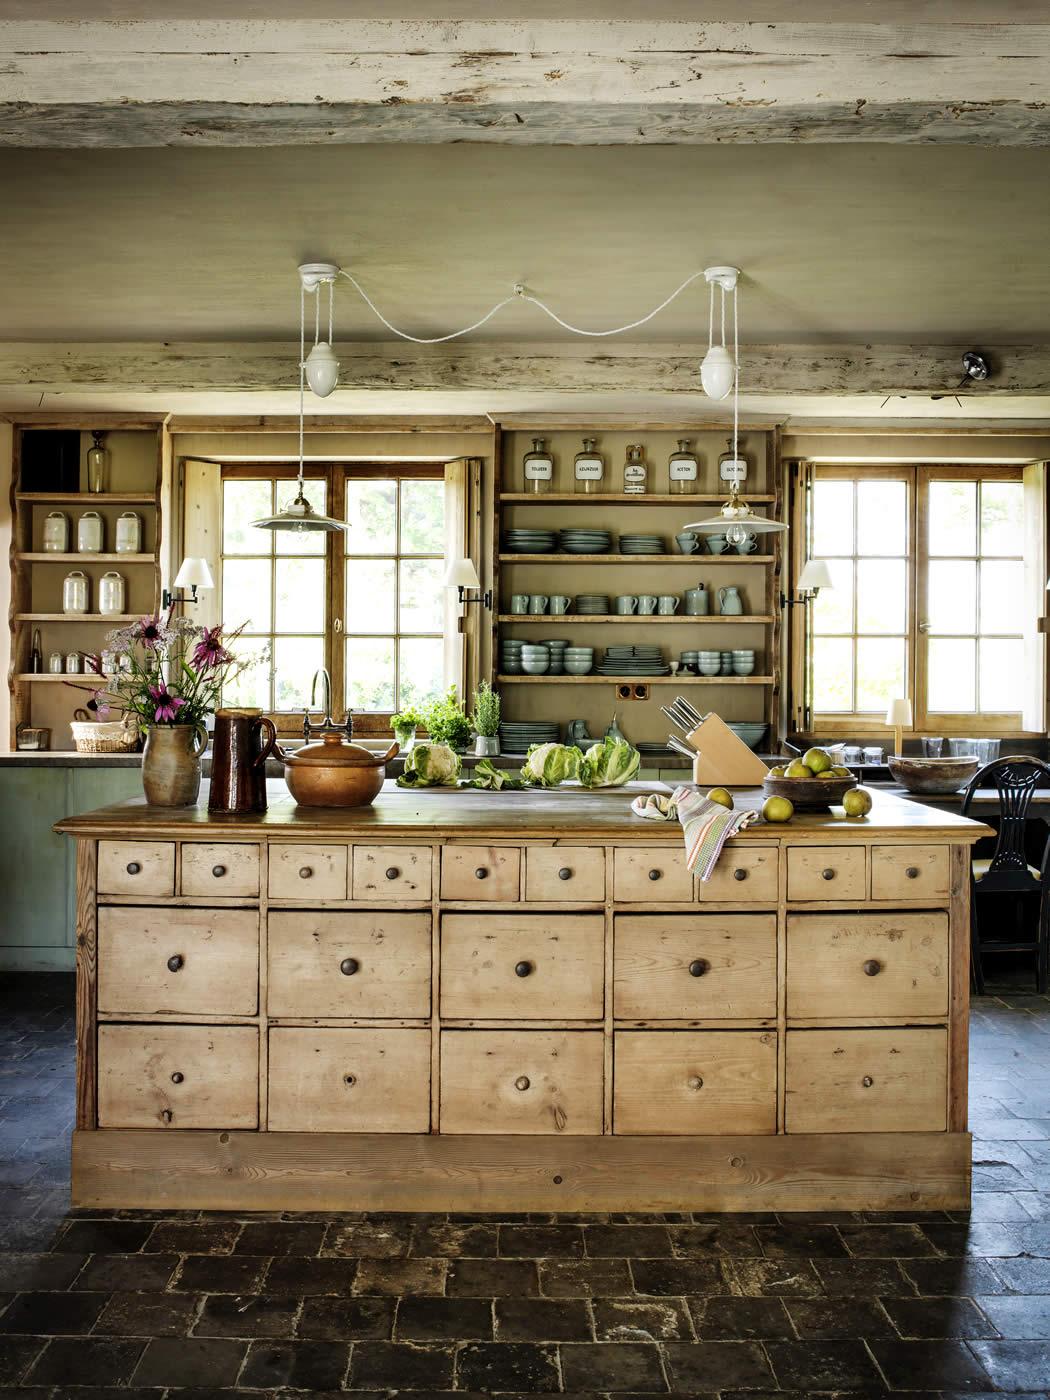 Keuken woonkamer met open keuken galerij foto 39 s van binnenlandse en moderne - Keuken woonkamer open keuken ...